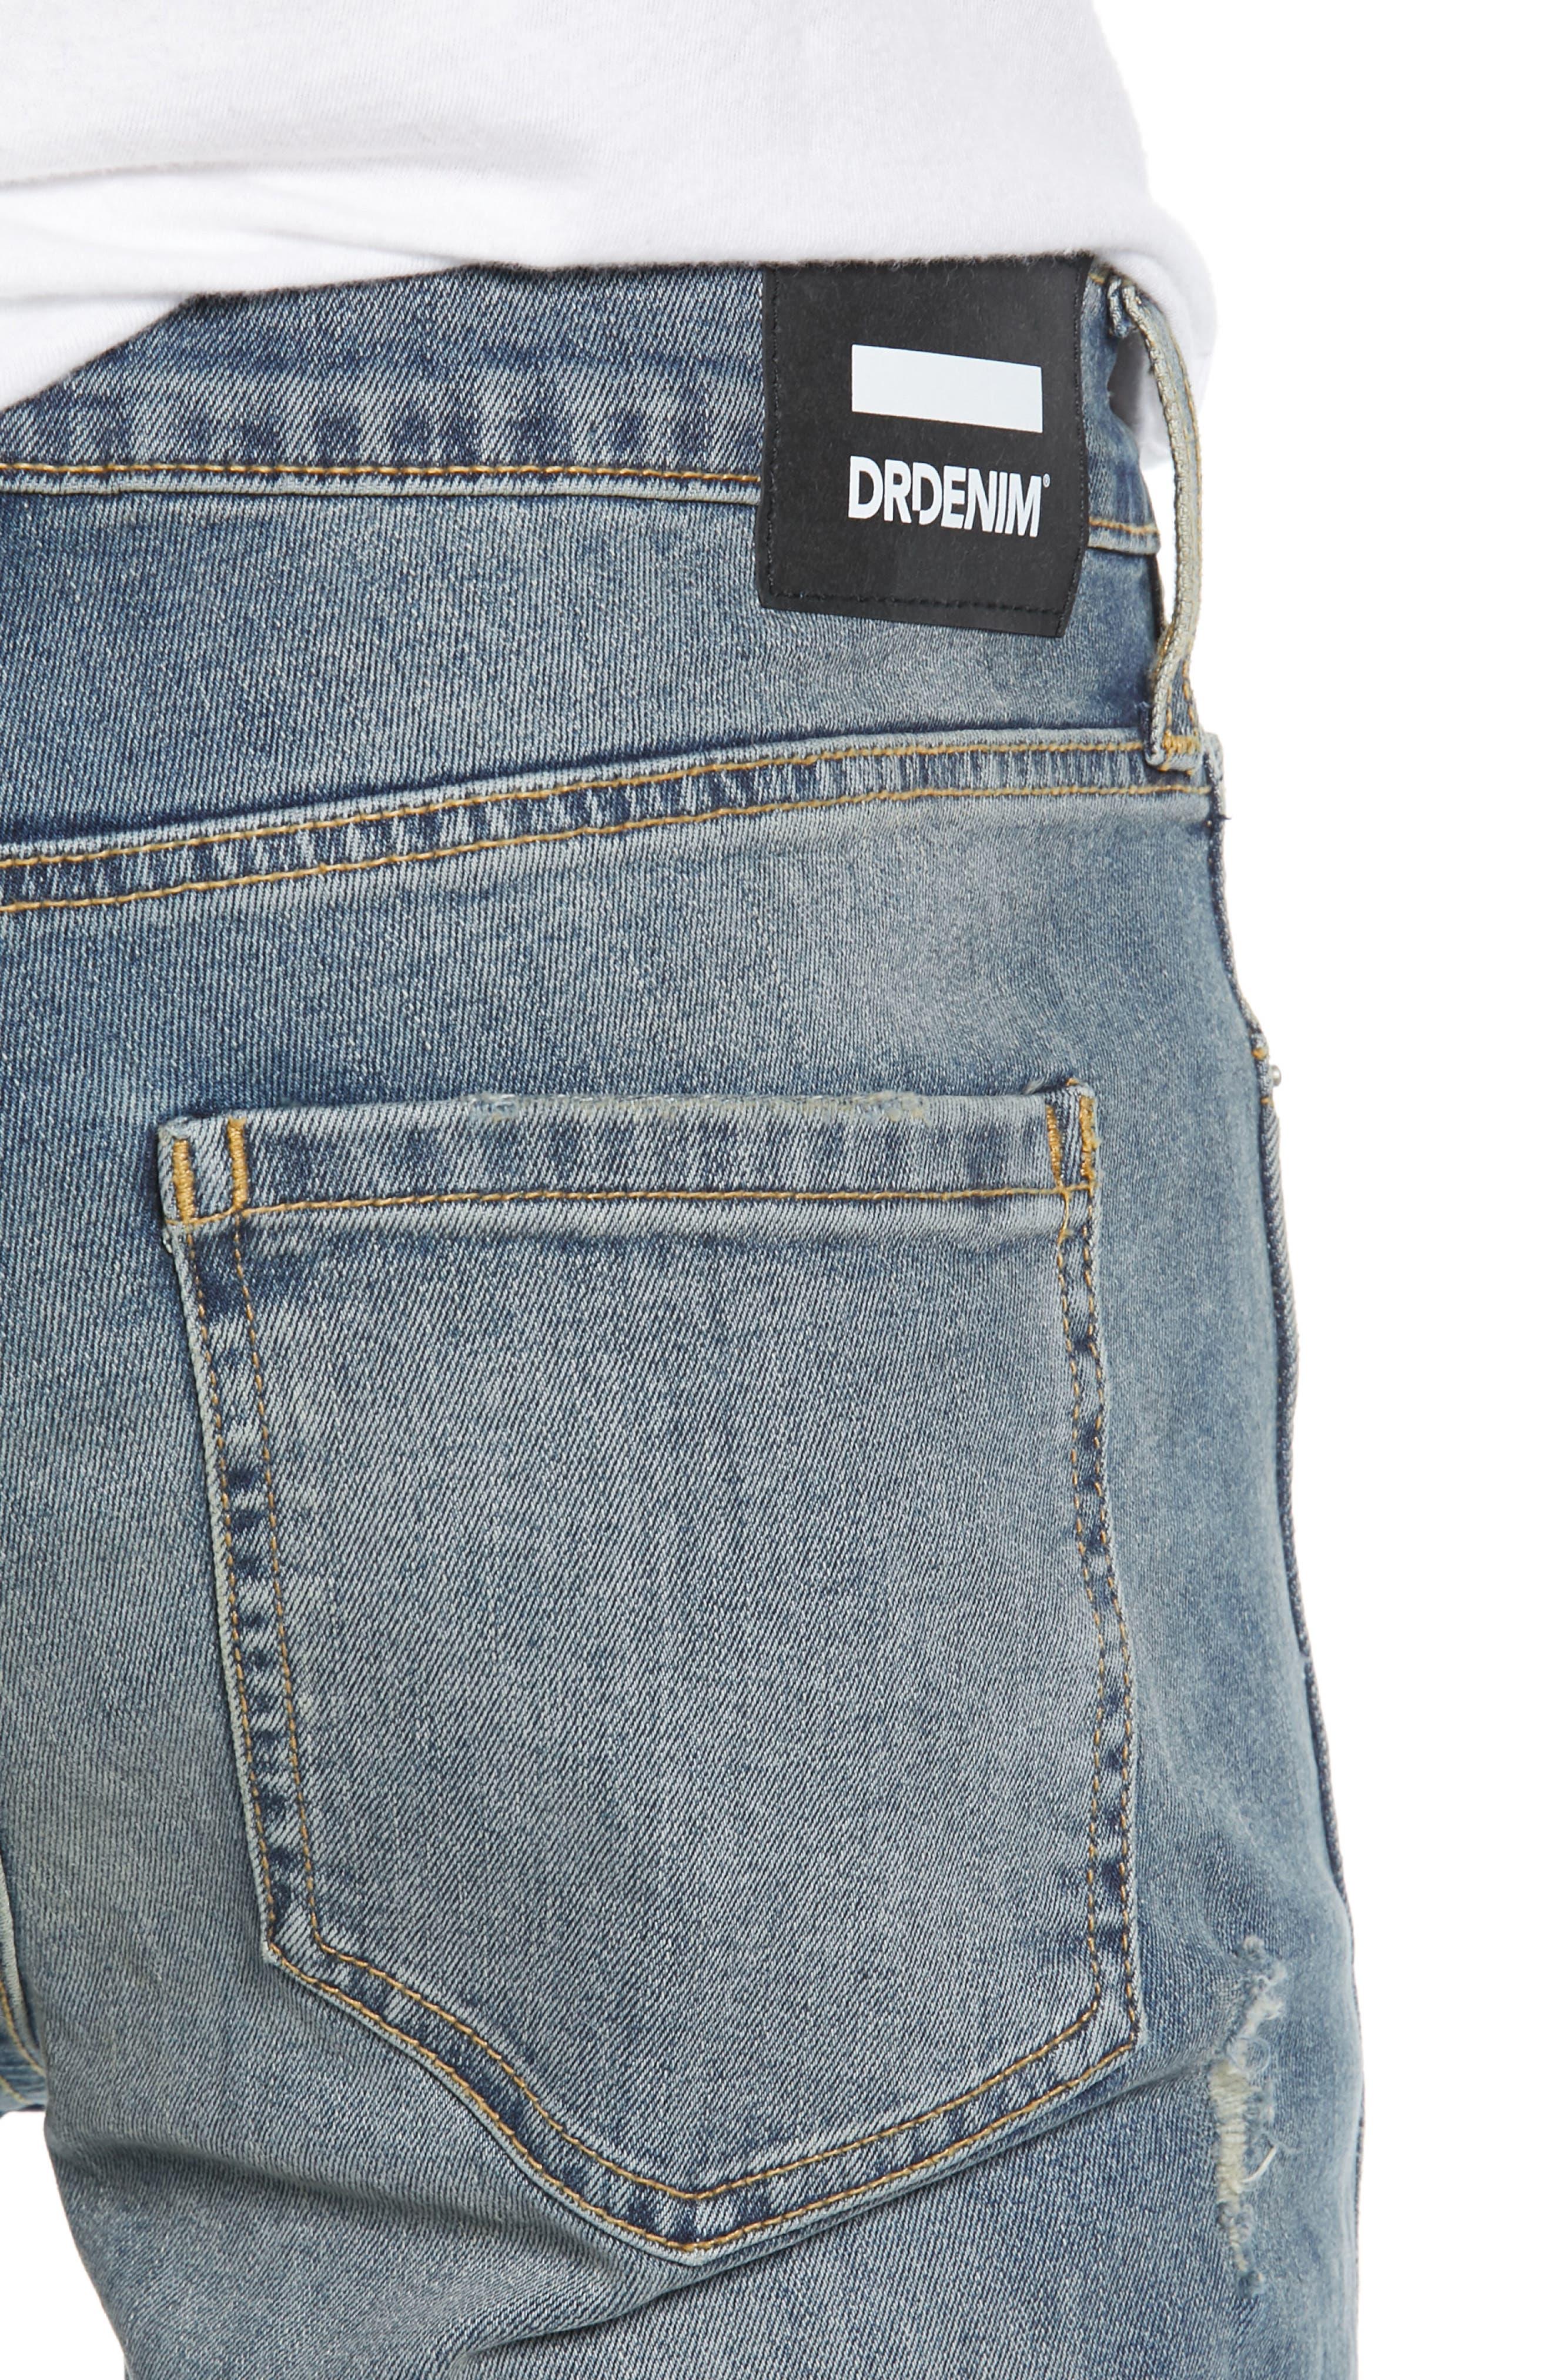 Snap Skinny Fit Jeans,                             Alternate thumbnail 4, color,                             LIGHT OLD DESTROY